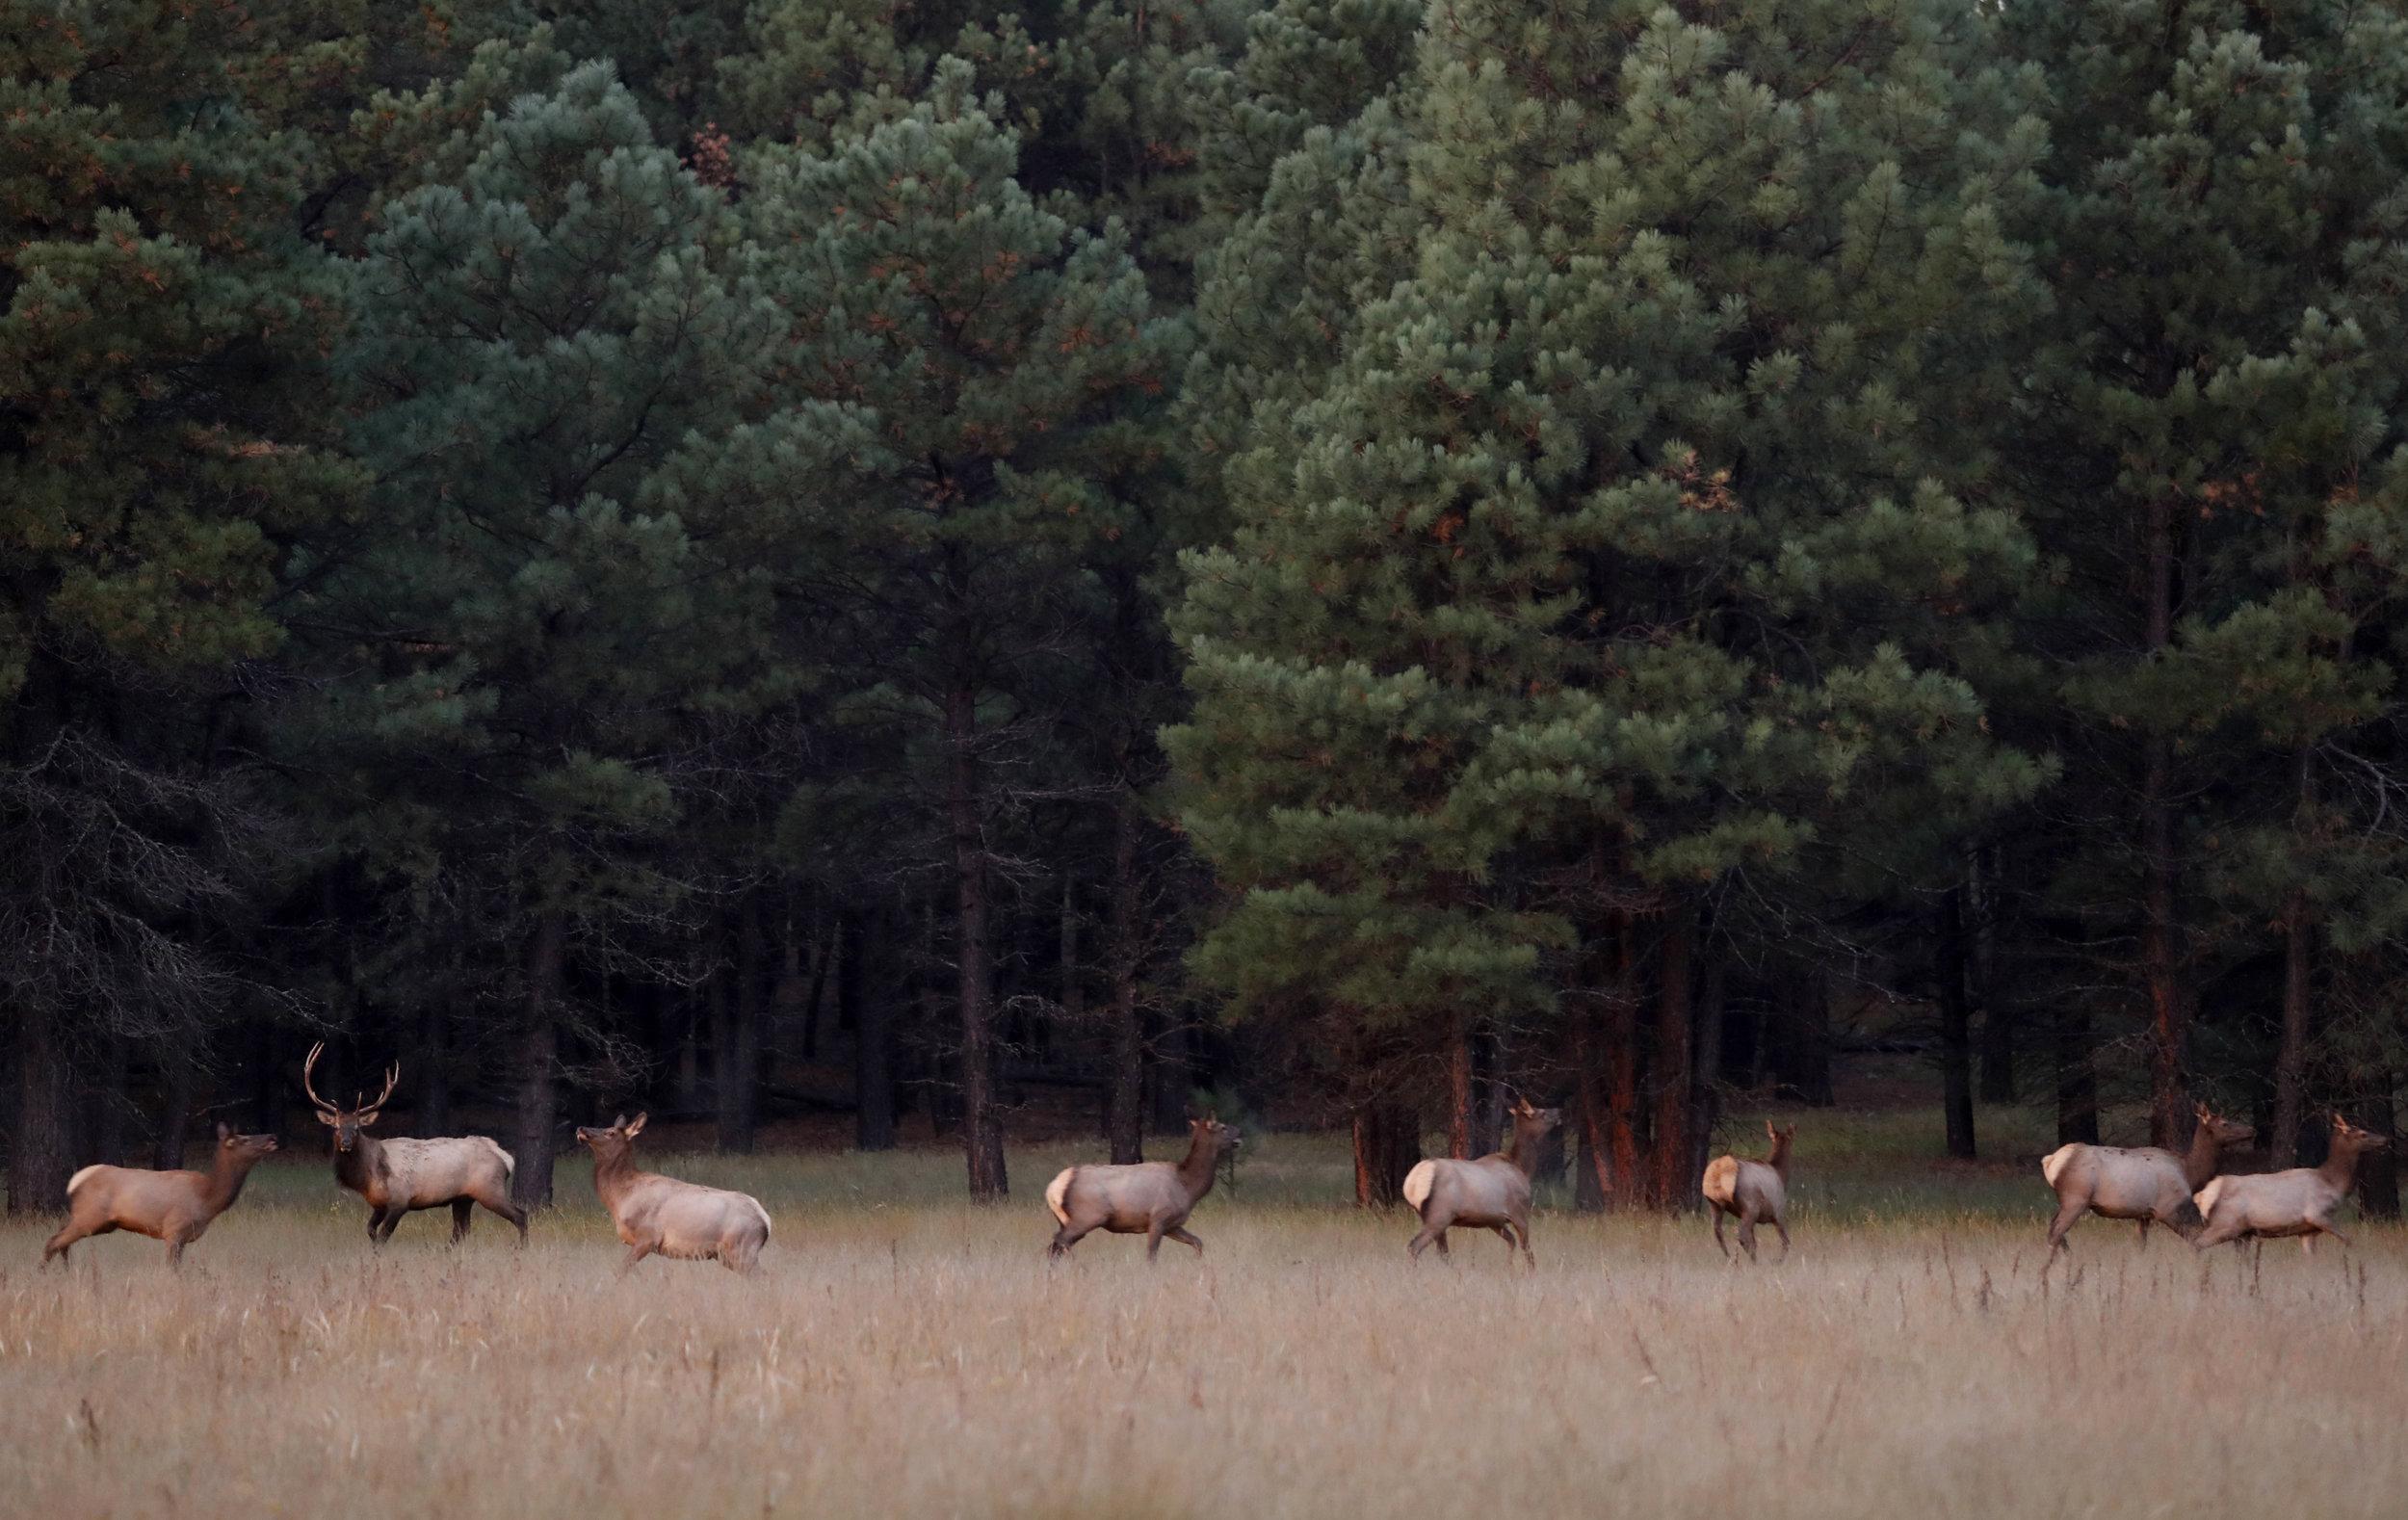 Elk run in a pasture at dawn on Saturday, Oct. 1, 2016, near Flagstaff, Ariz. (Kevin Martin)